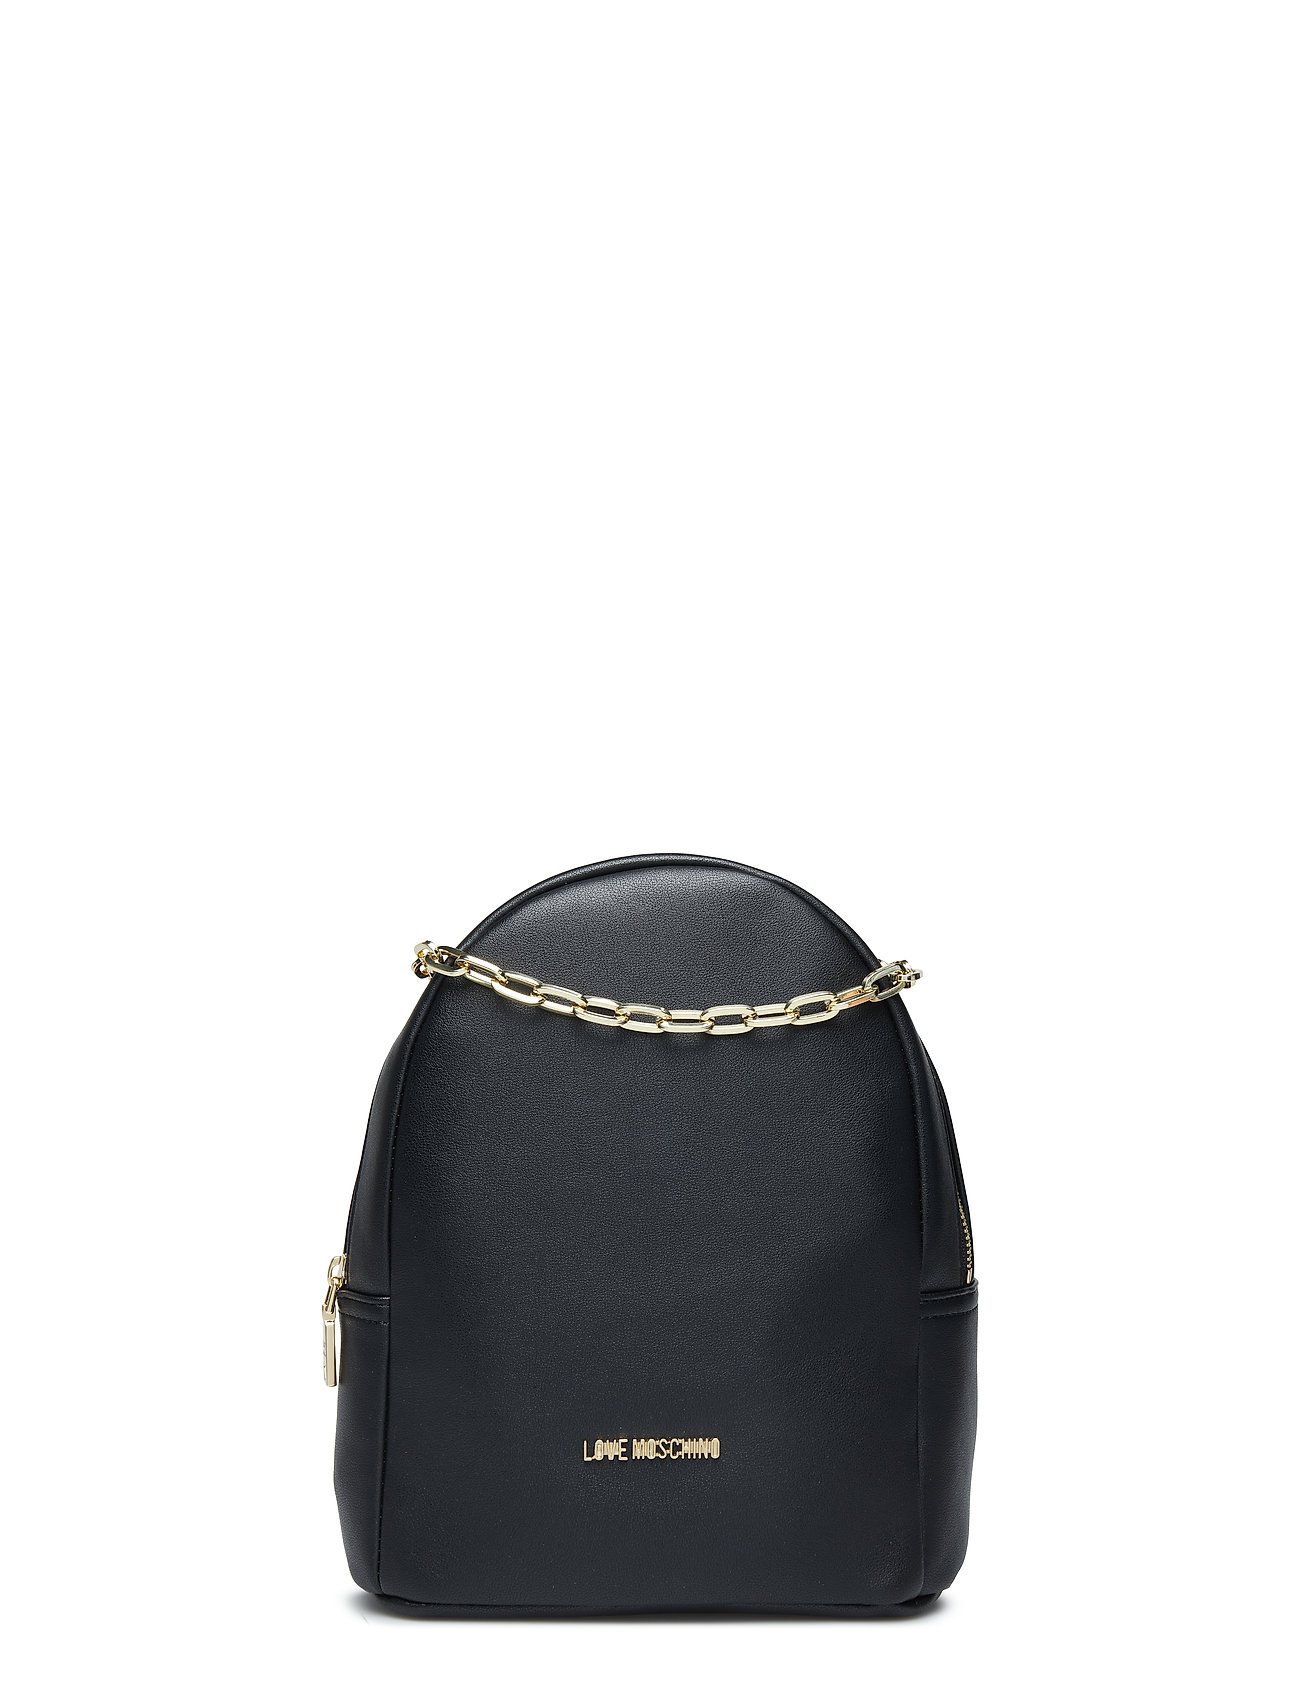 Bag Love Bag Bag Moschino Love Love Moschino Moschino Bag Moschino Love Love yO8mNwn0v